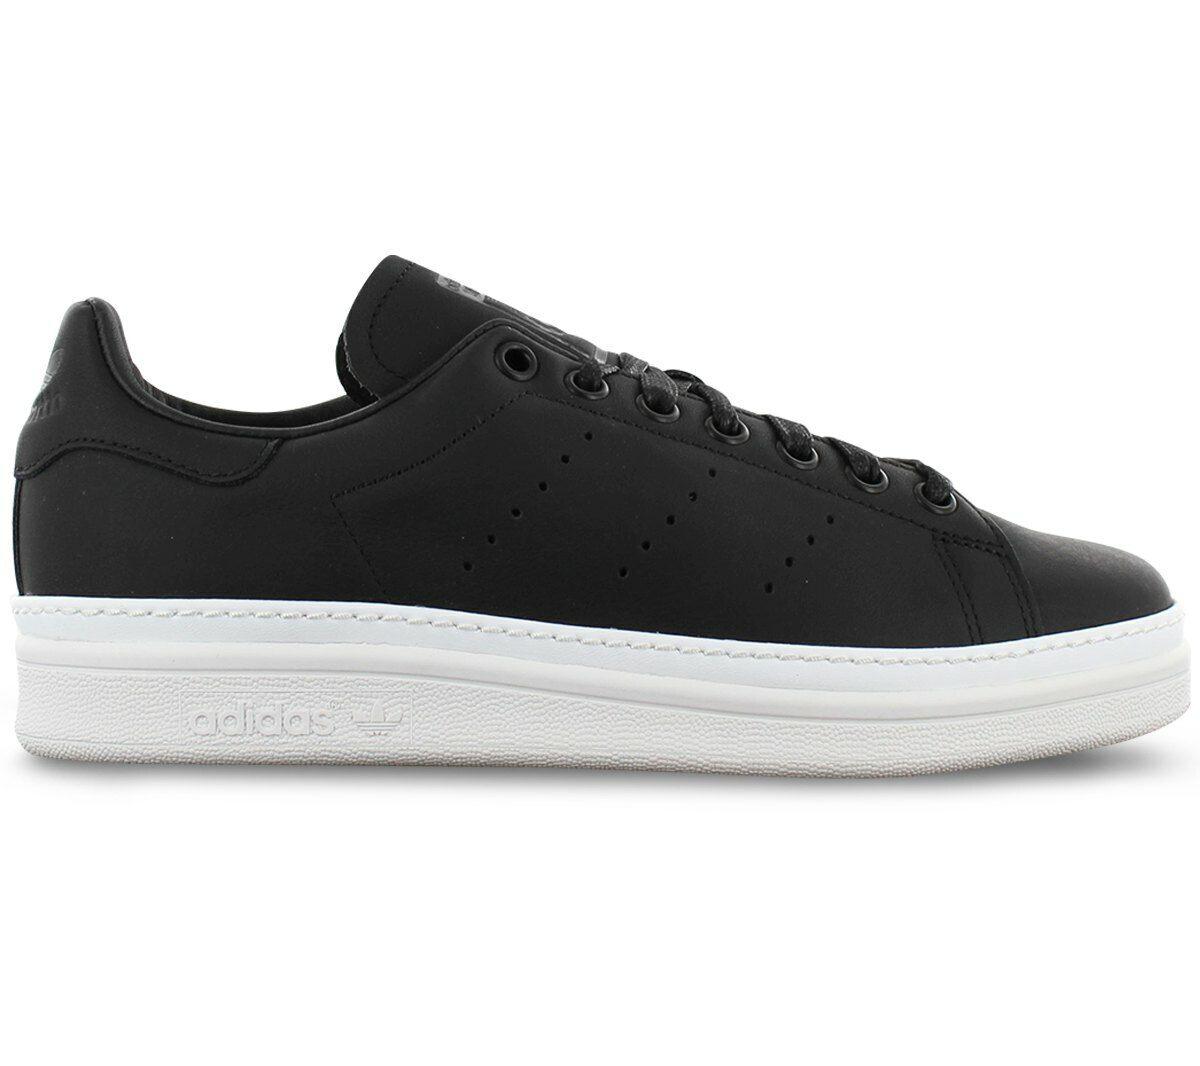 Adidas Originals Stan Smith New Bold W Damen Turnschuhe B28152 Schwarz Schuhe NEU